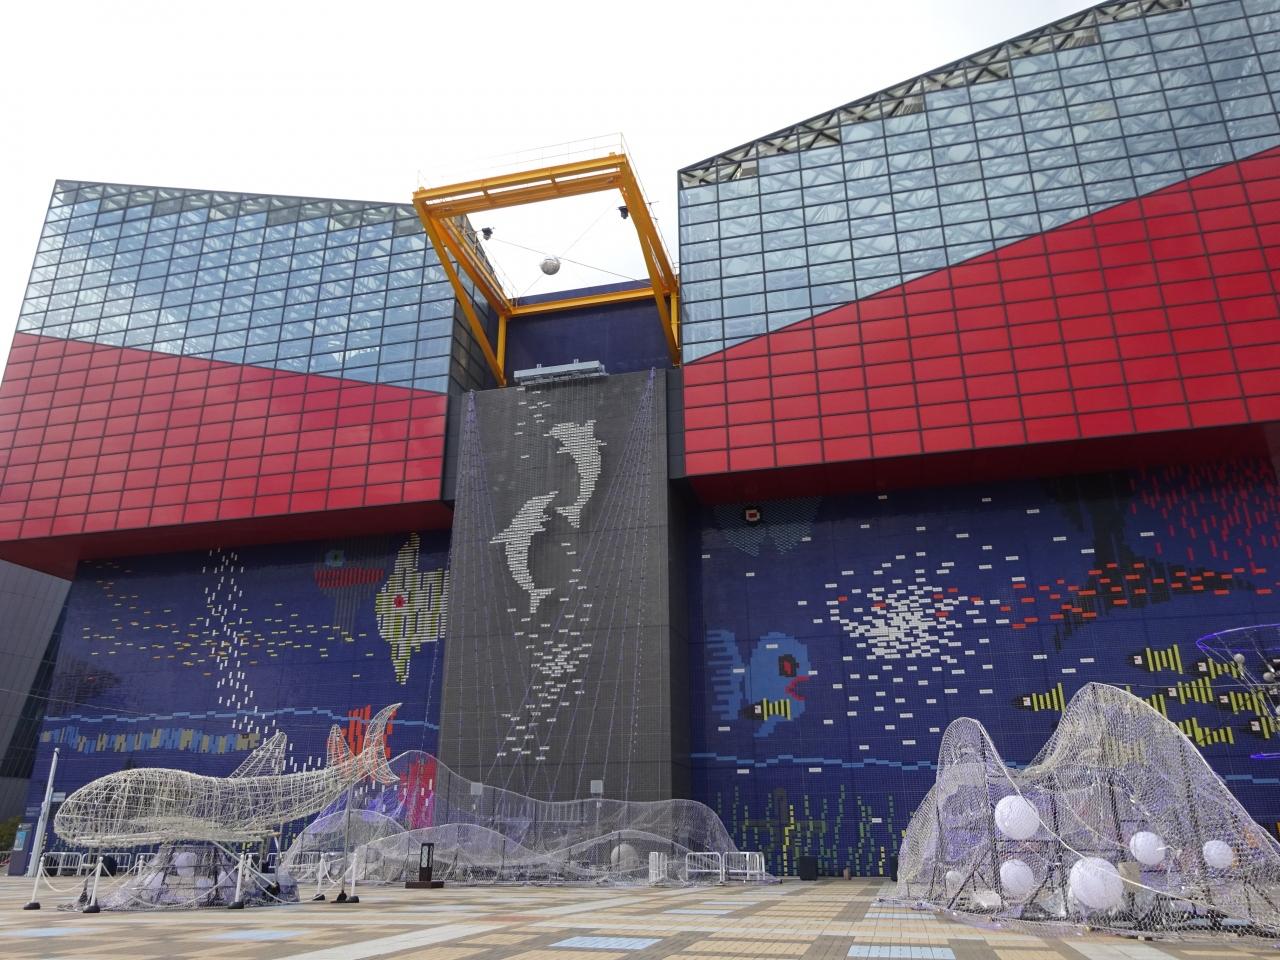 jalマイルで格安旅行☆還暦母と共に大阪旅行!3日目 海遊館~大阪城